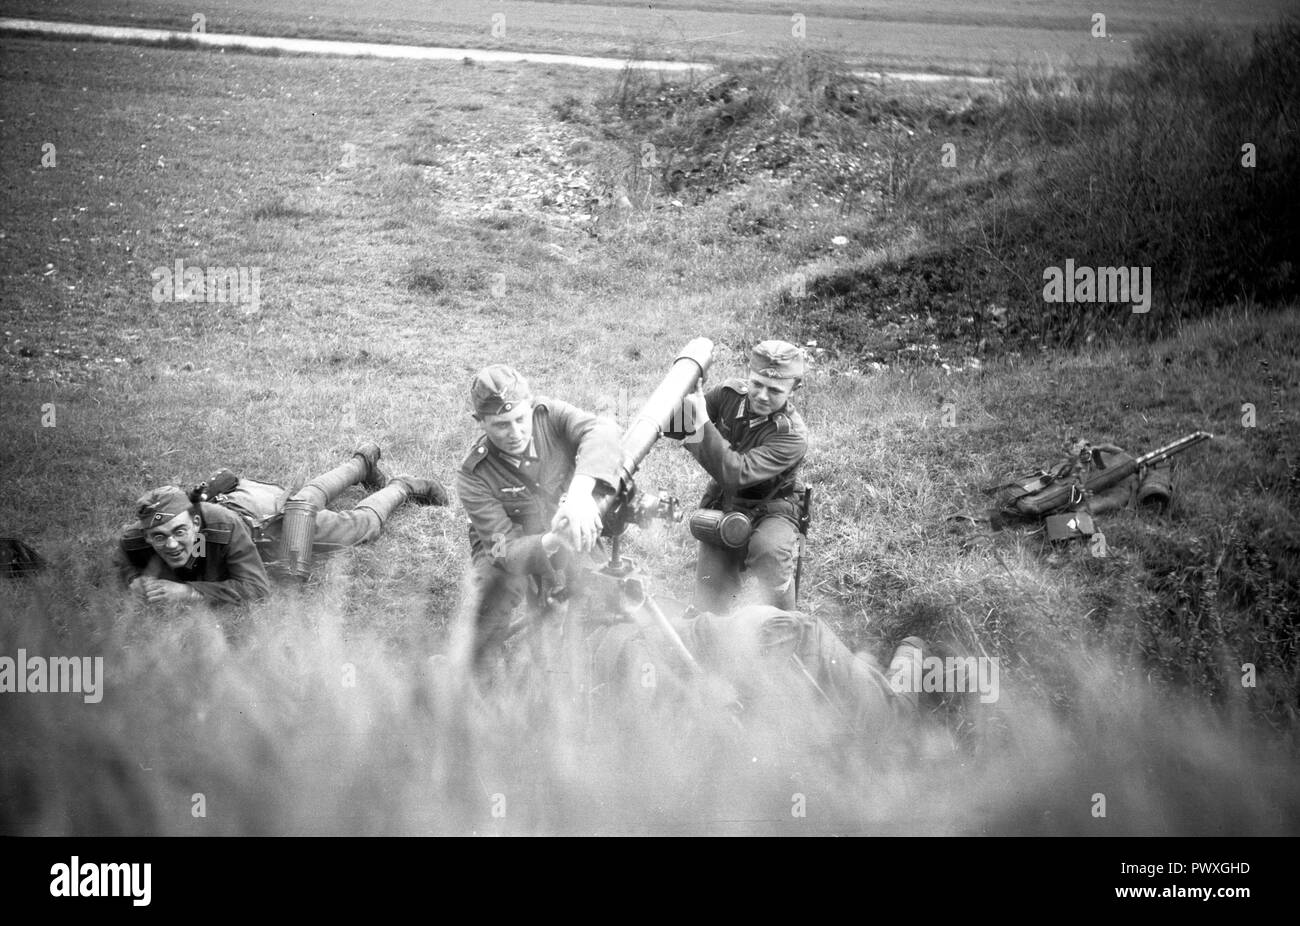 Wehrmacht Heer Granatwerfer GrW 34 8,1 cm,81 mm / German Army grenade launcher or mortar 8,1cm, 81mm - Stock Image